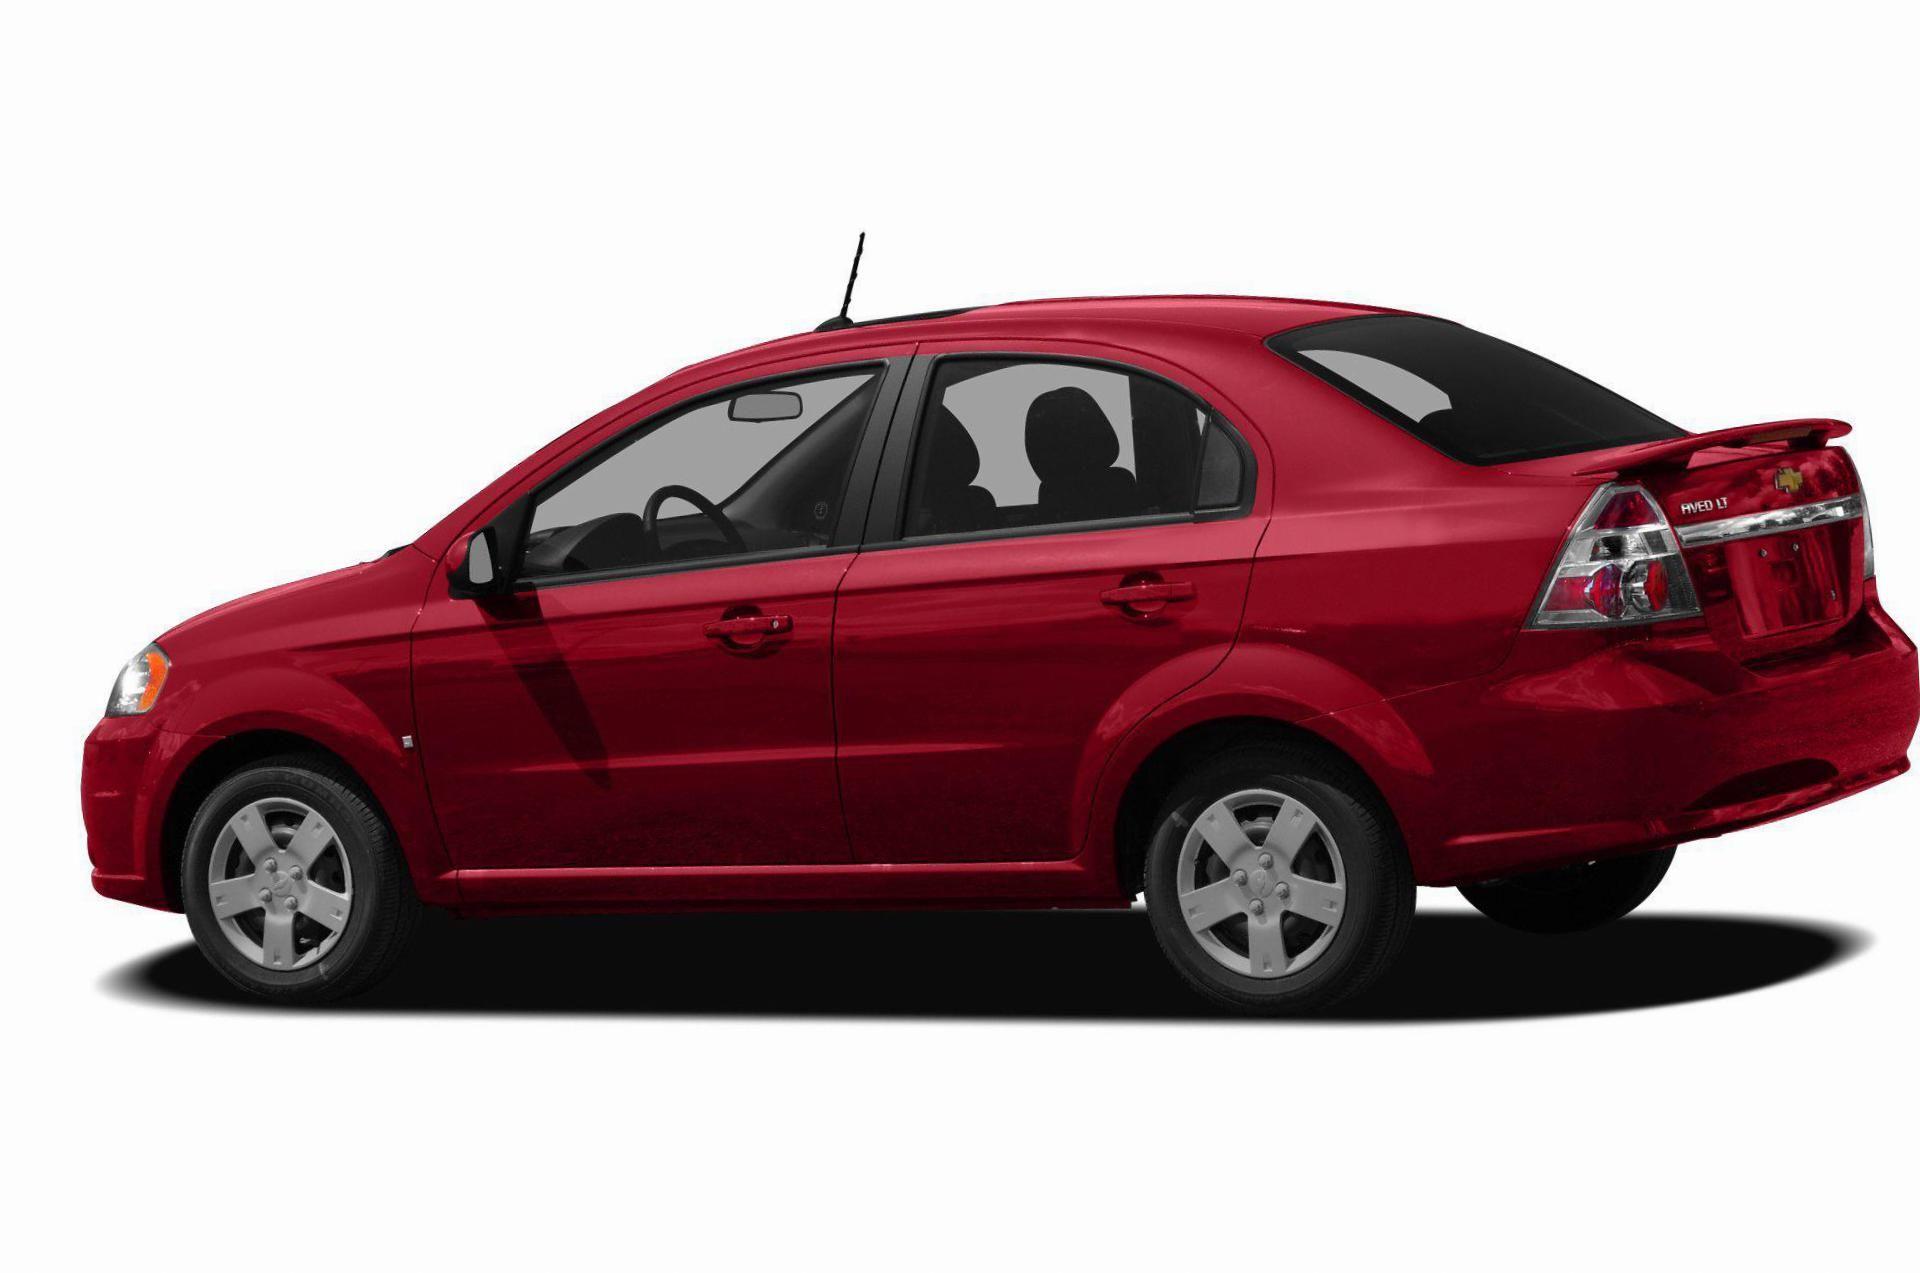 Chevrolet aveo hatchback 5d prices http autotras com auto pinterest d chevrolet aveo and hatchbacks